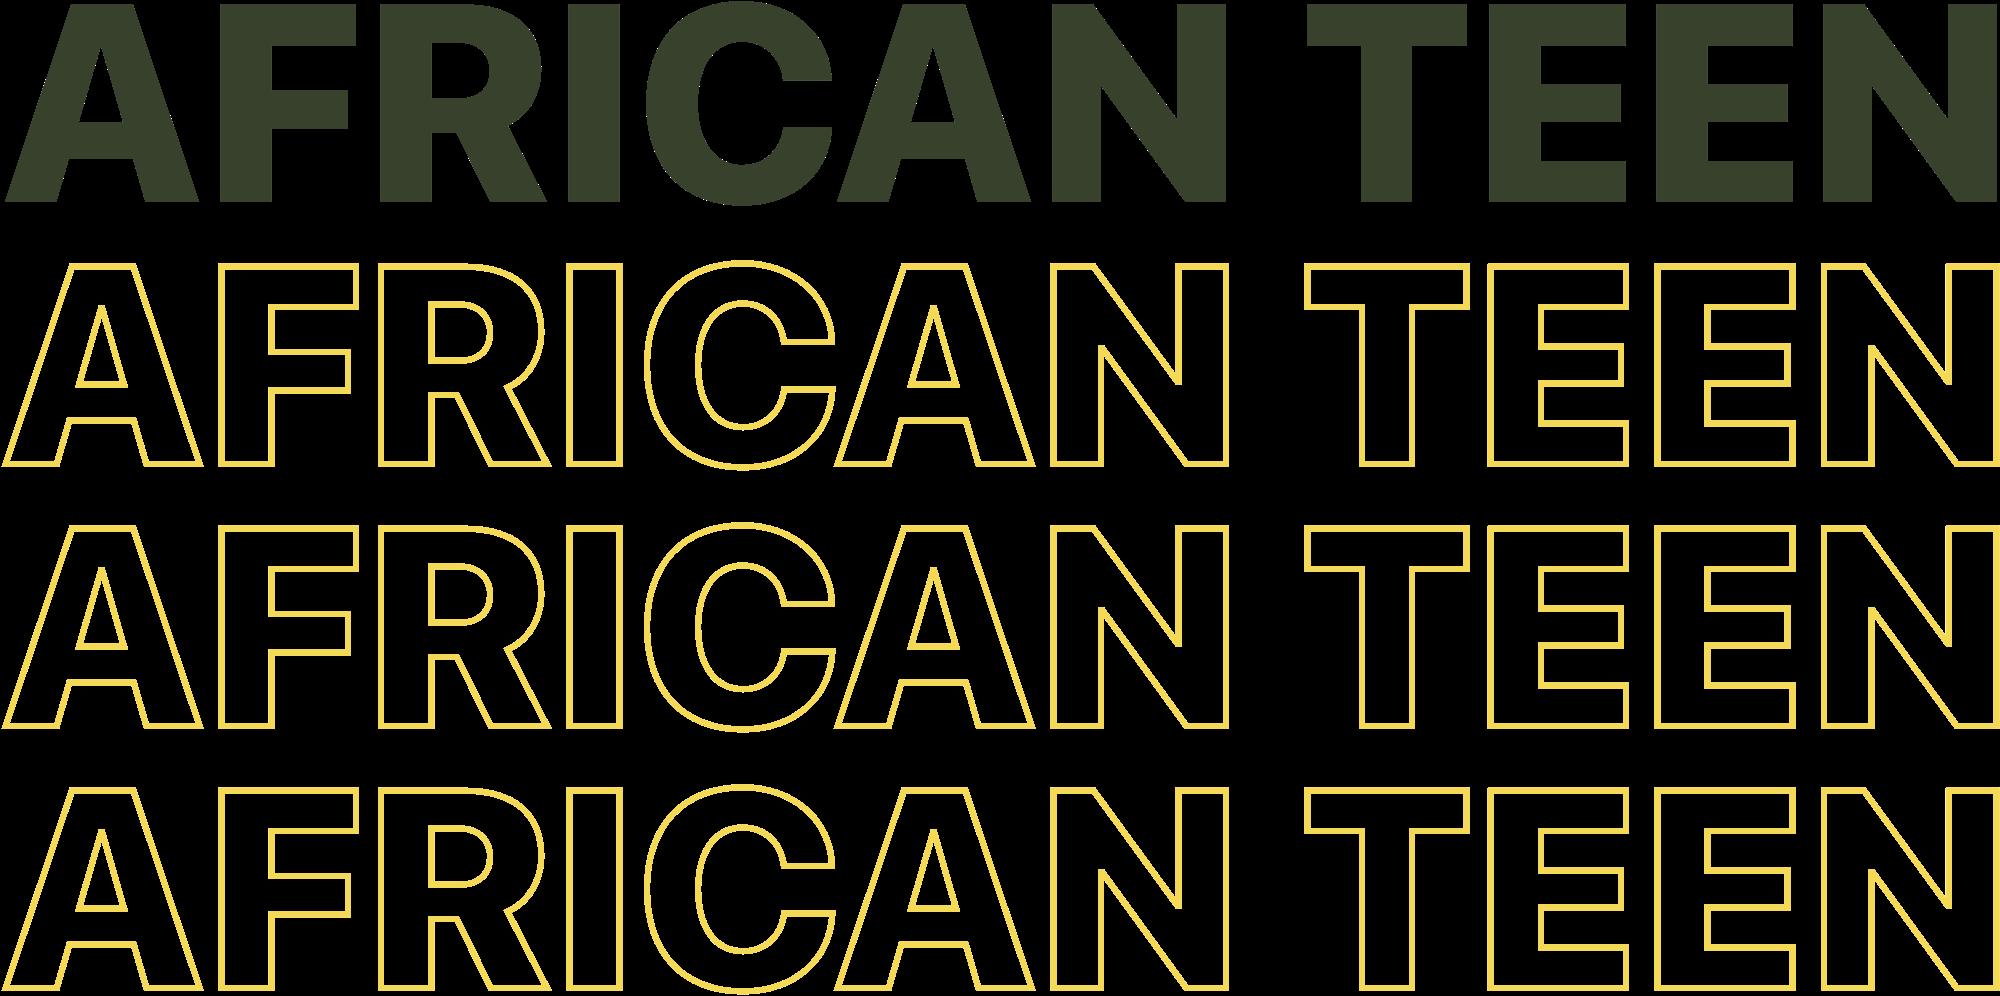 African Teen group